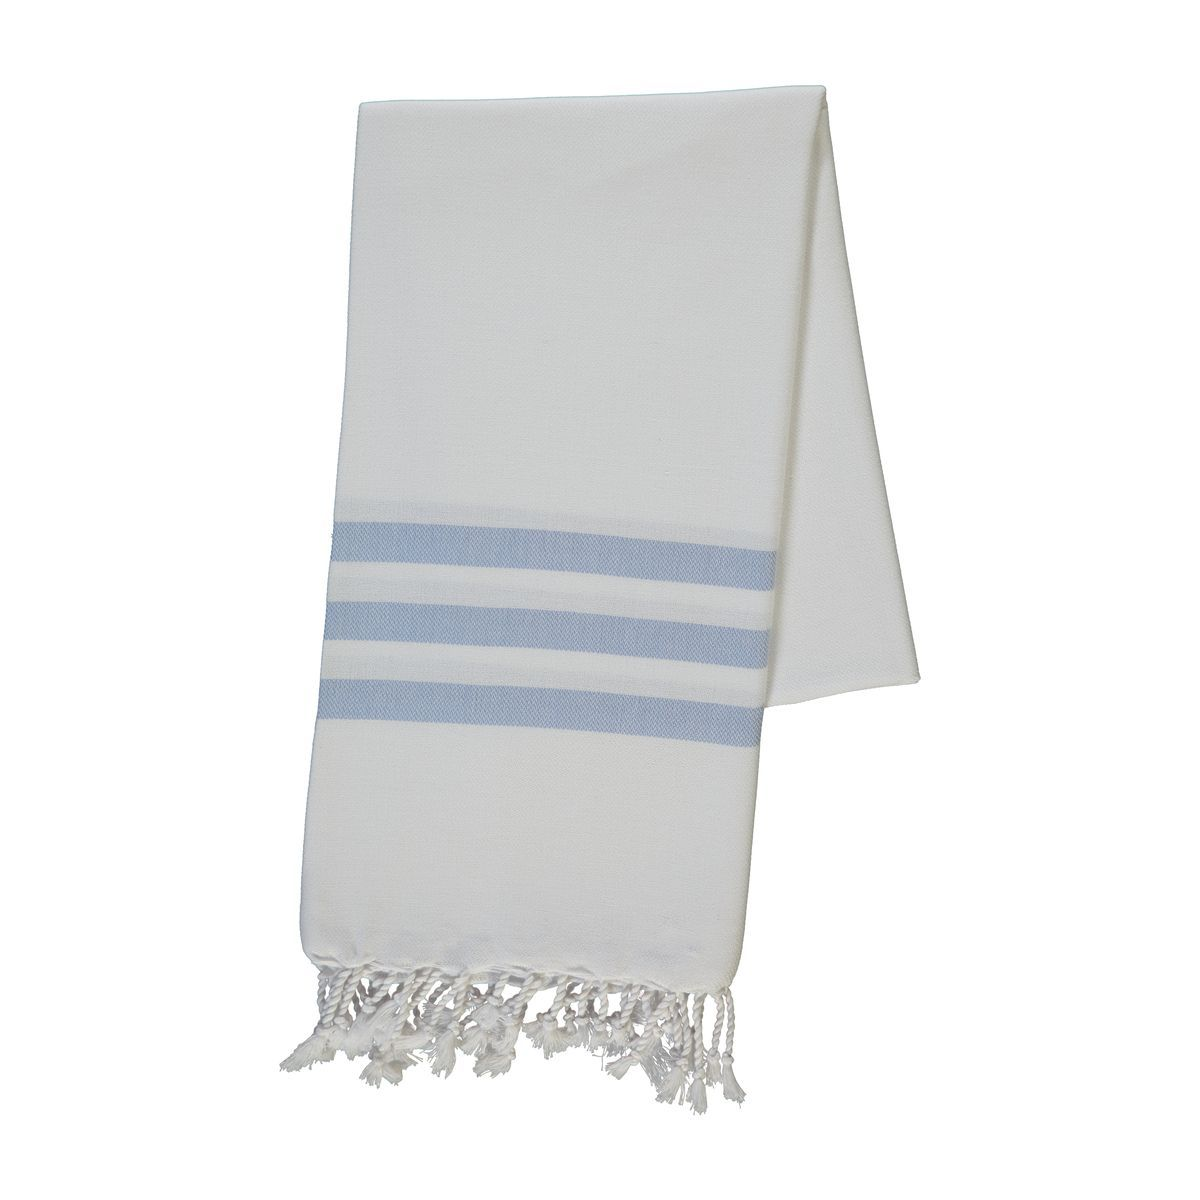 Peştemal Bala Sultan - Beyaz/Mavi